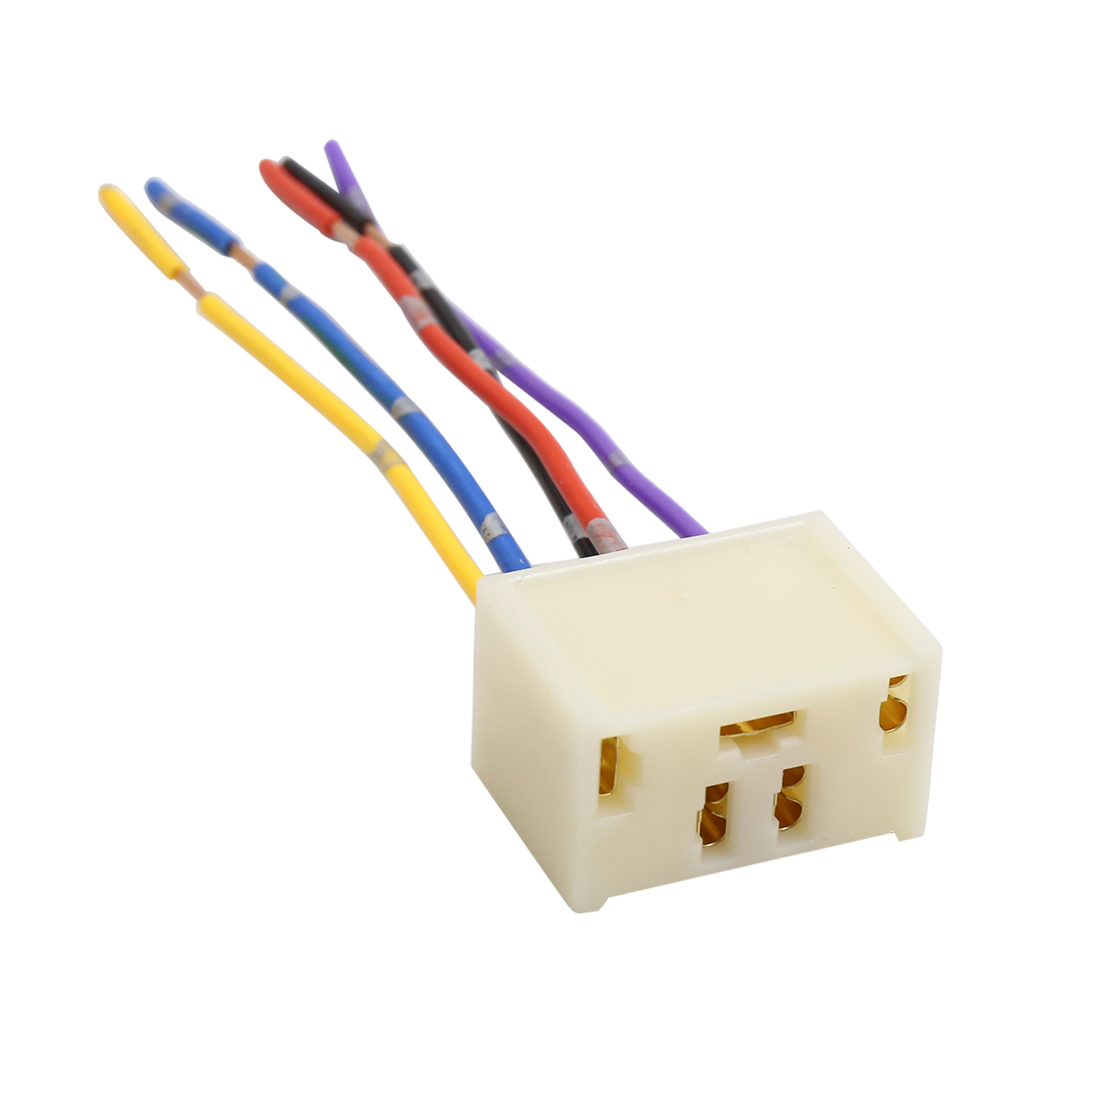 hight resolution of 4pcs dc 12v 5 pin car power window switch socket wiring harness plug 3 wire harness repair window